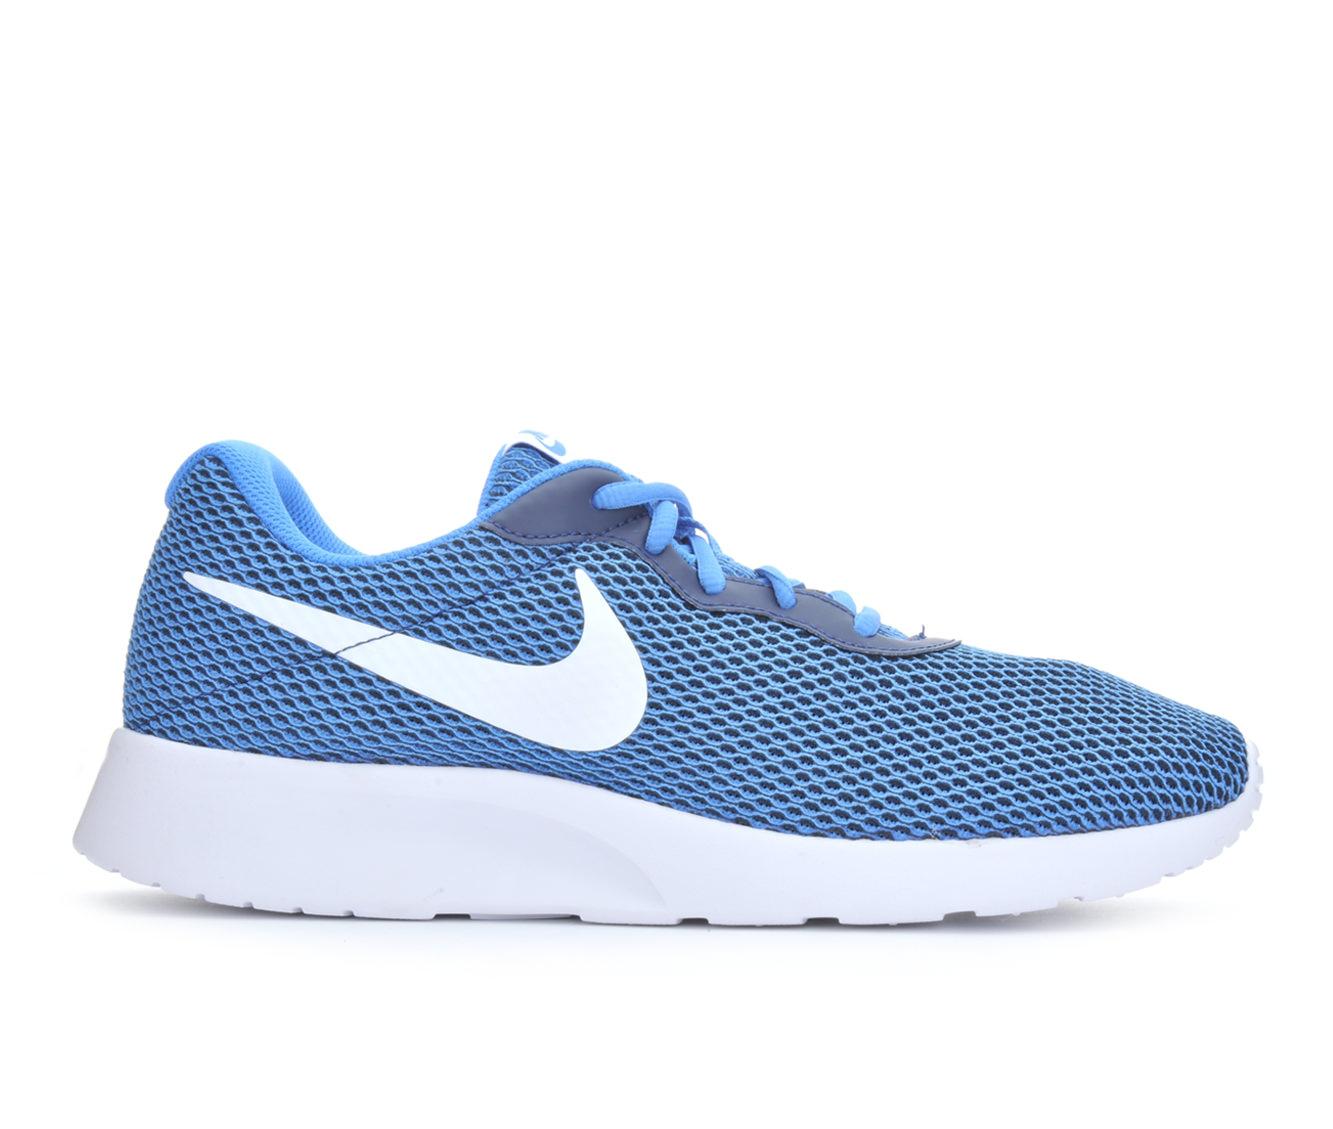 Men's Nike Tanjun SE Sneakers (Blue - Size 9.5) 1650429